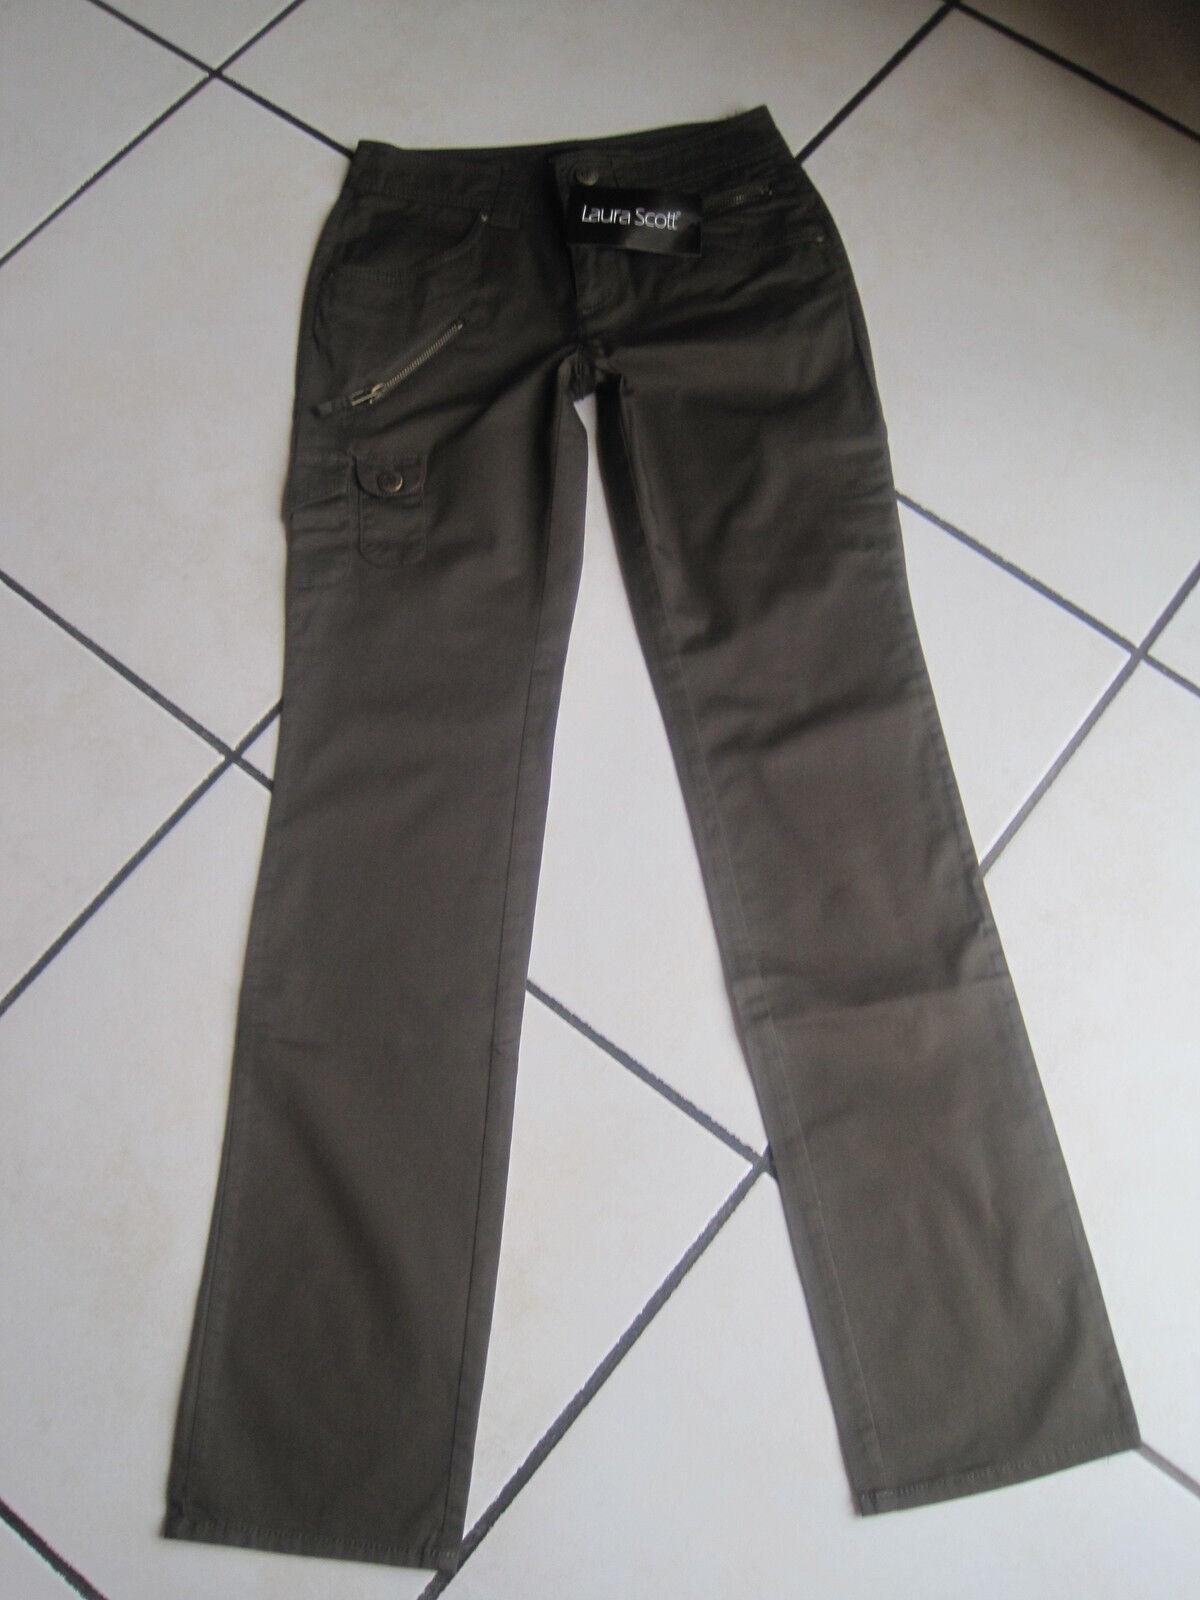 Laura Scott Cargo-Jeans Gr. 32 (16) - Länge 101 cm BW 34 5-36 5 cm dehnb.